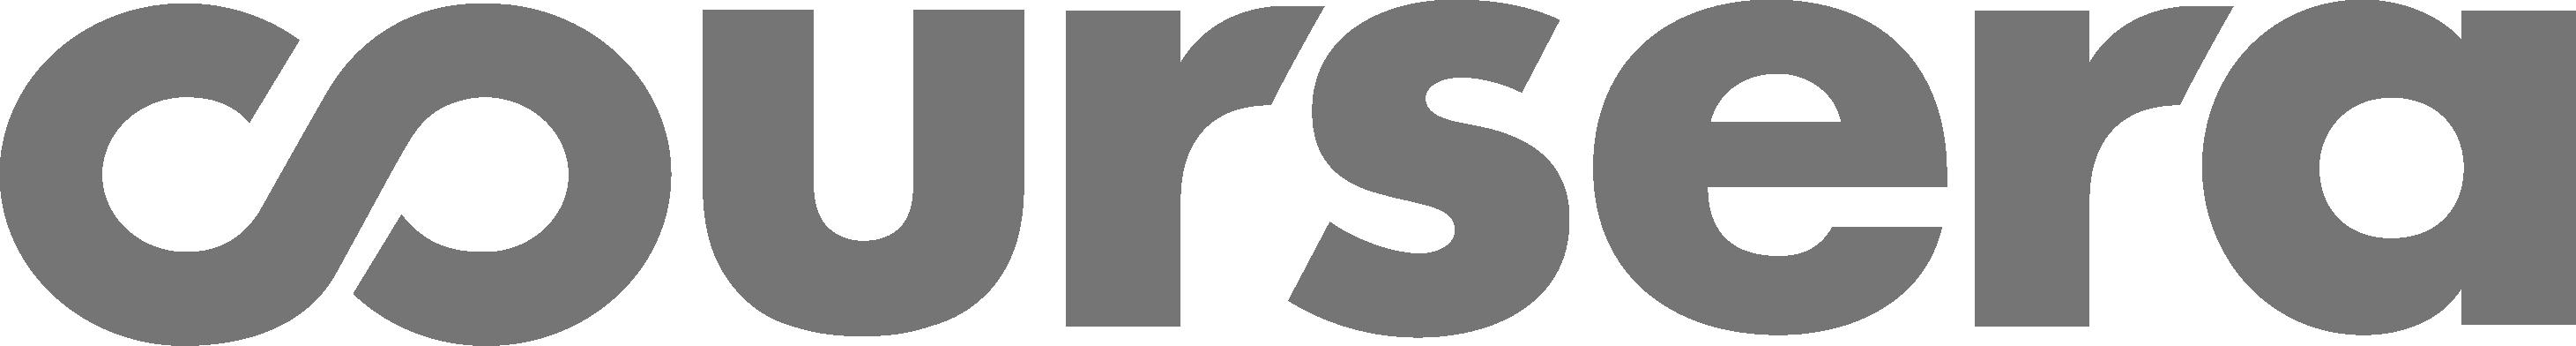 Coursera Logo png